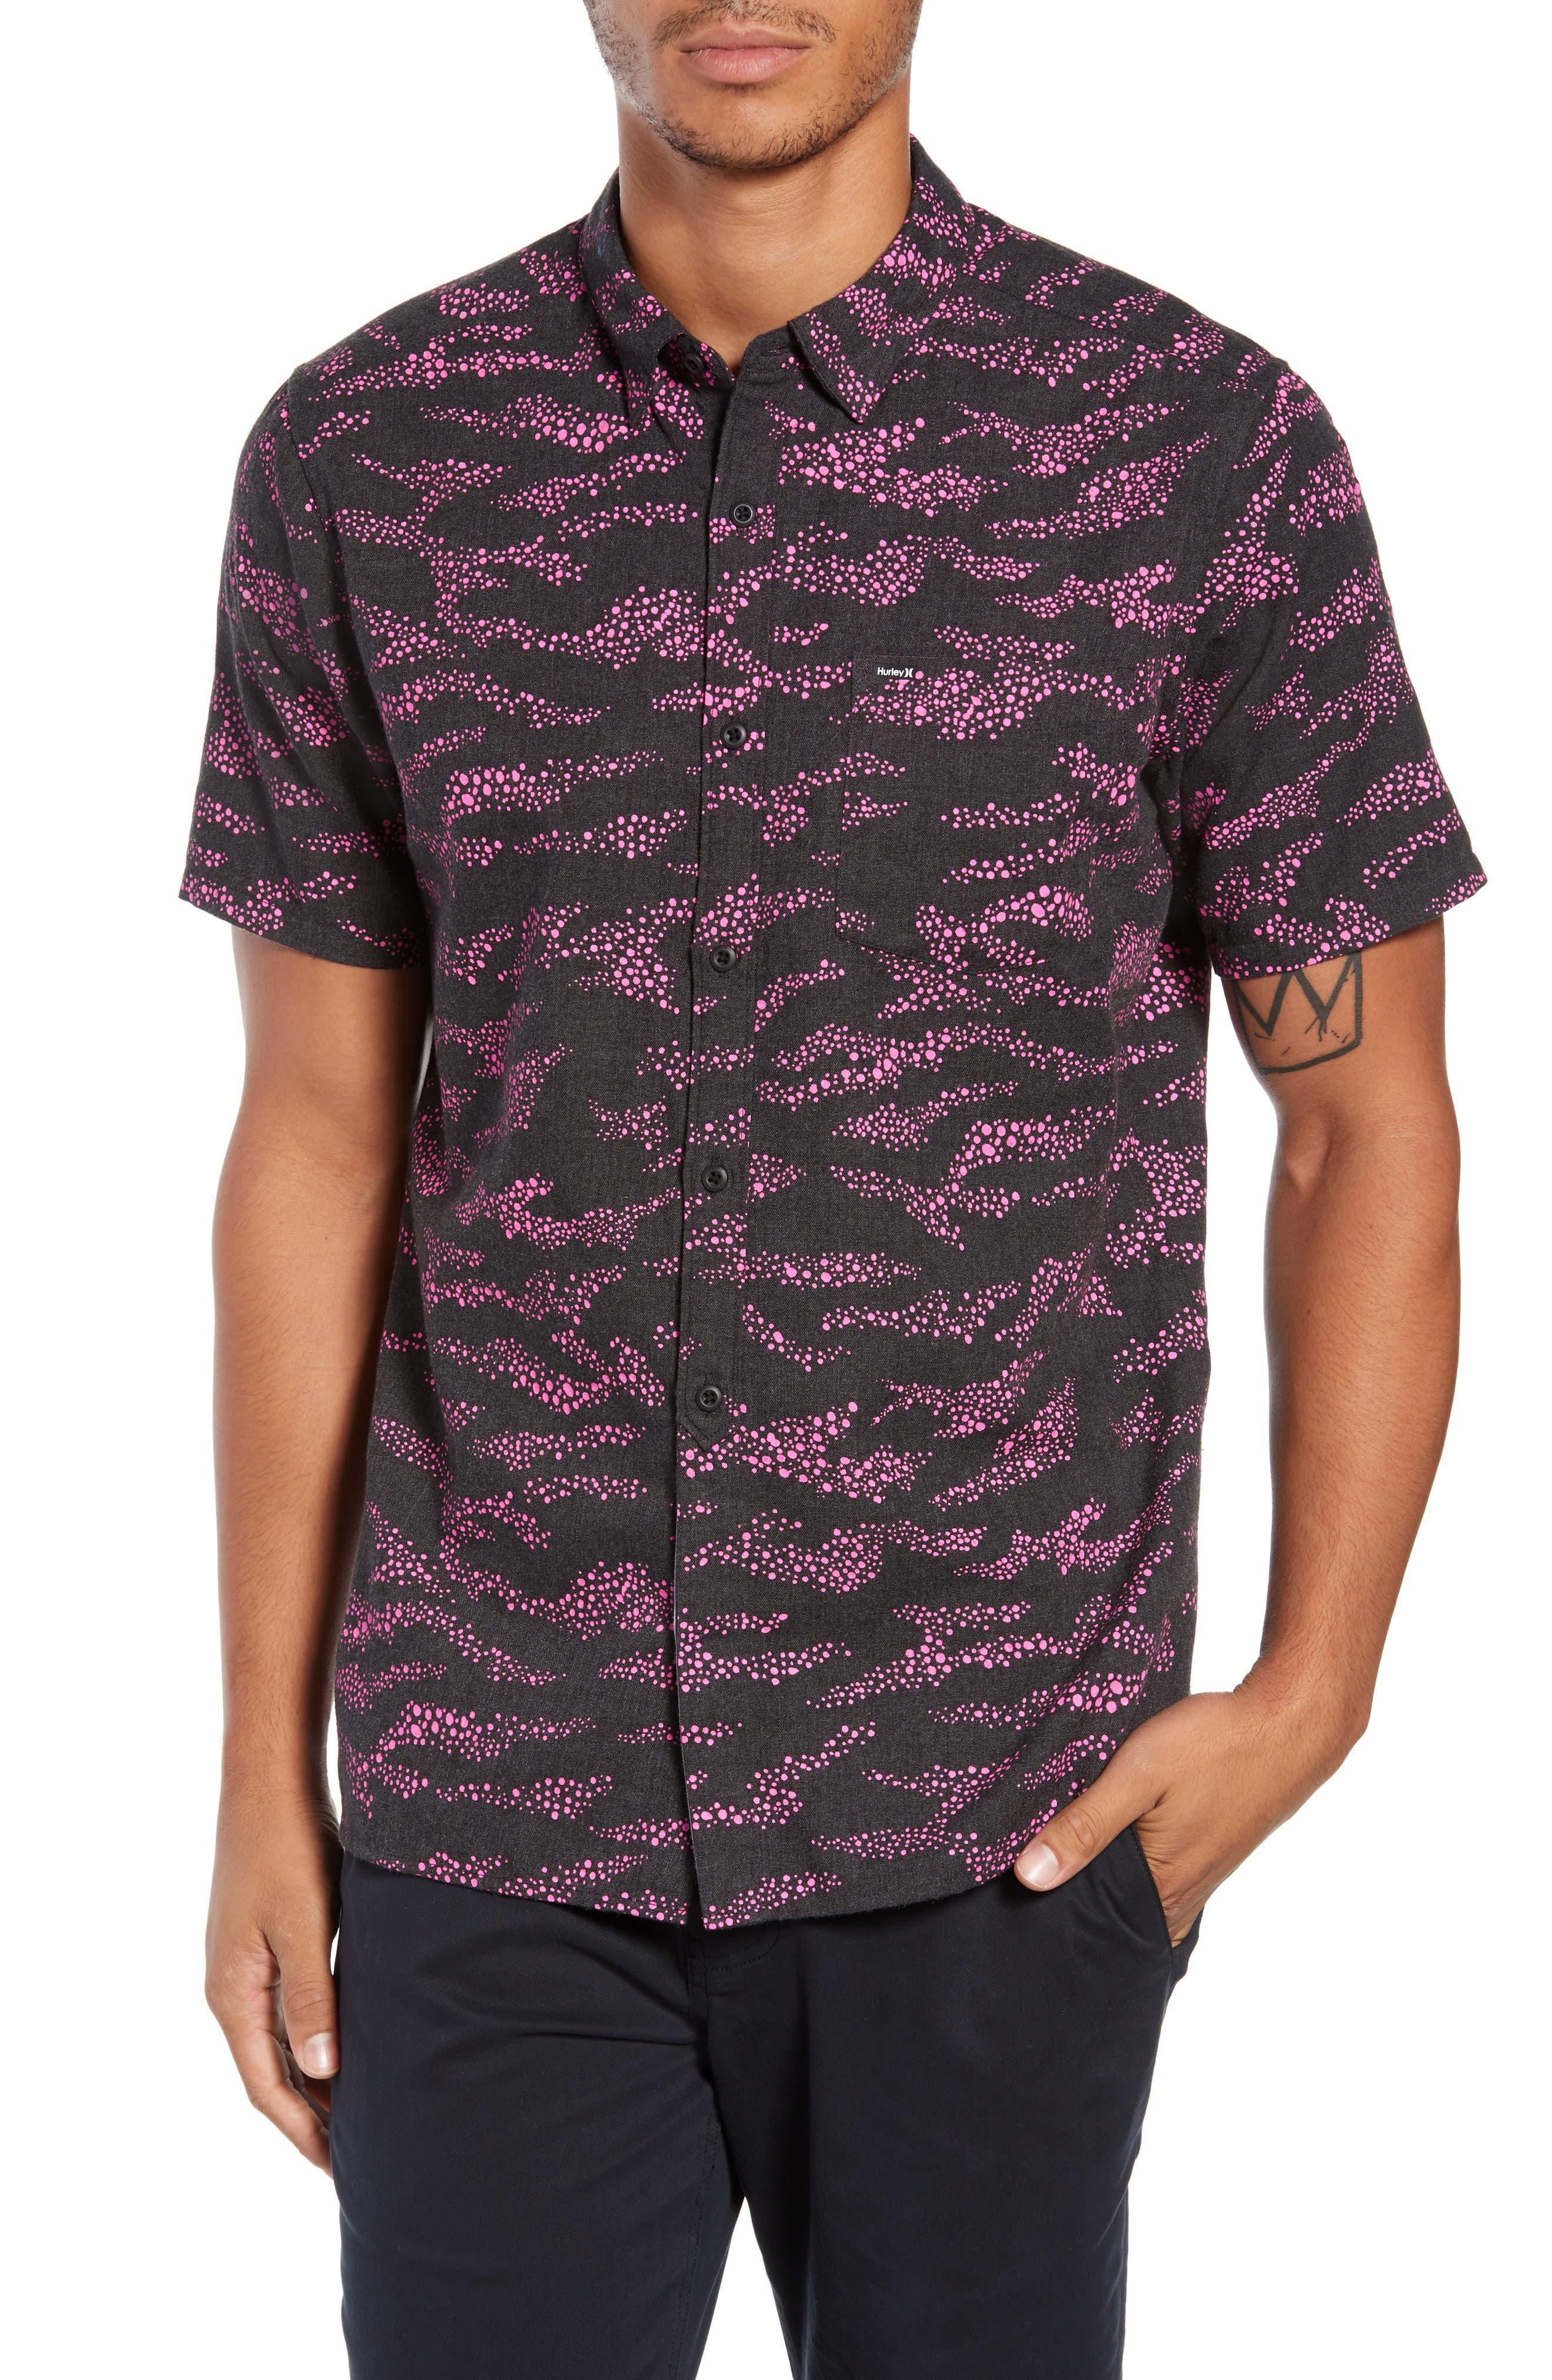 Outcast Woven Shirt,                         Main,                         color, BLACK HEATHER